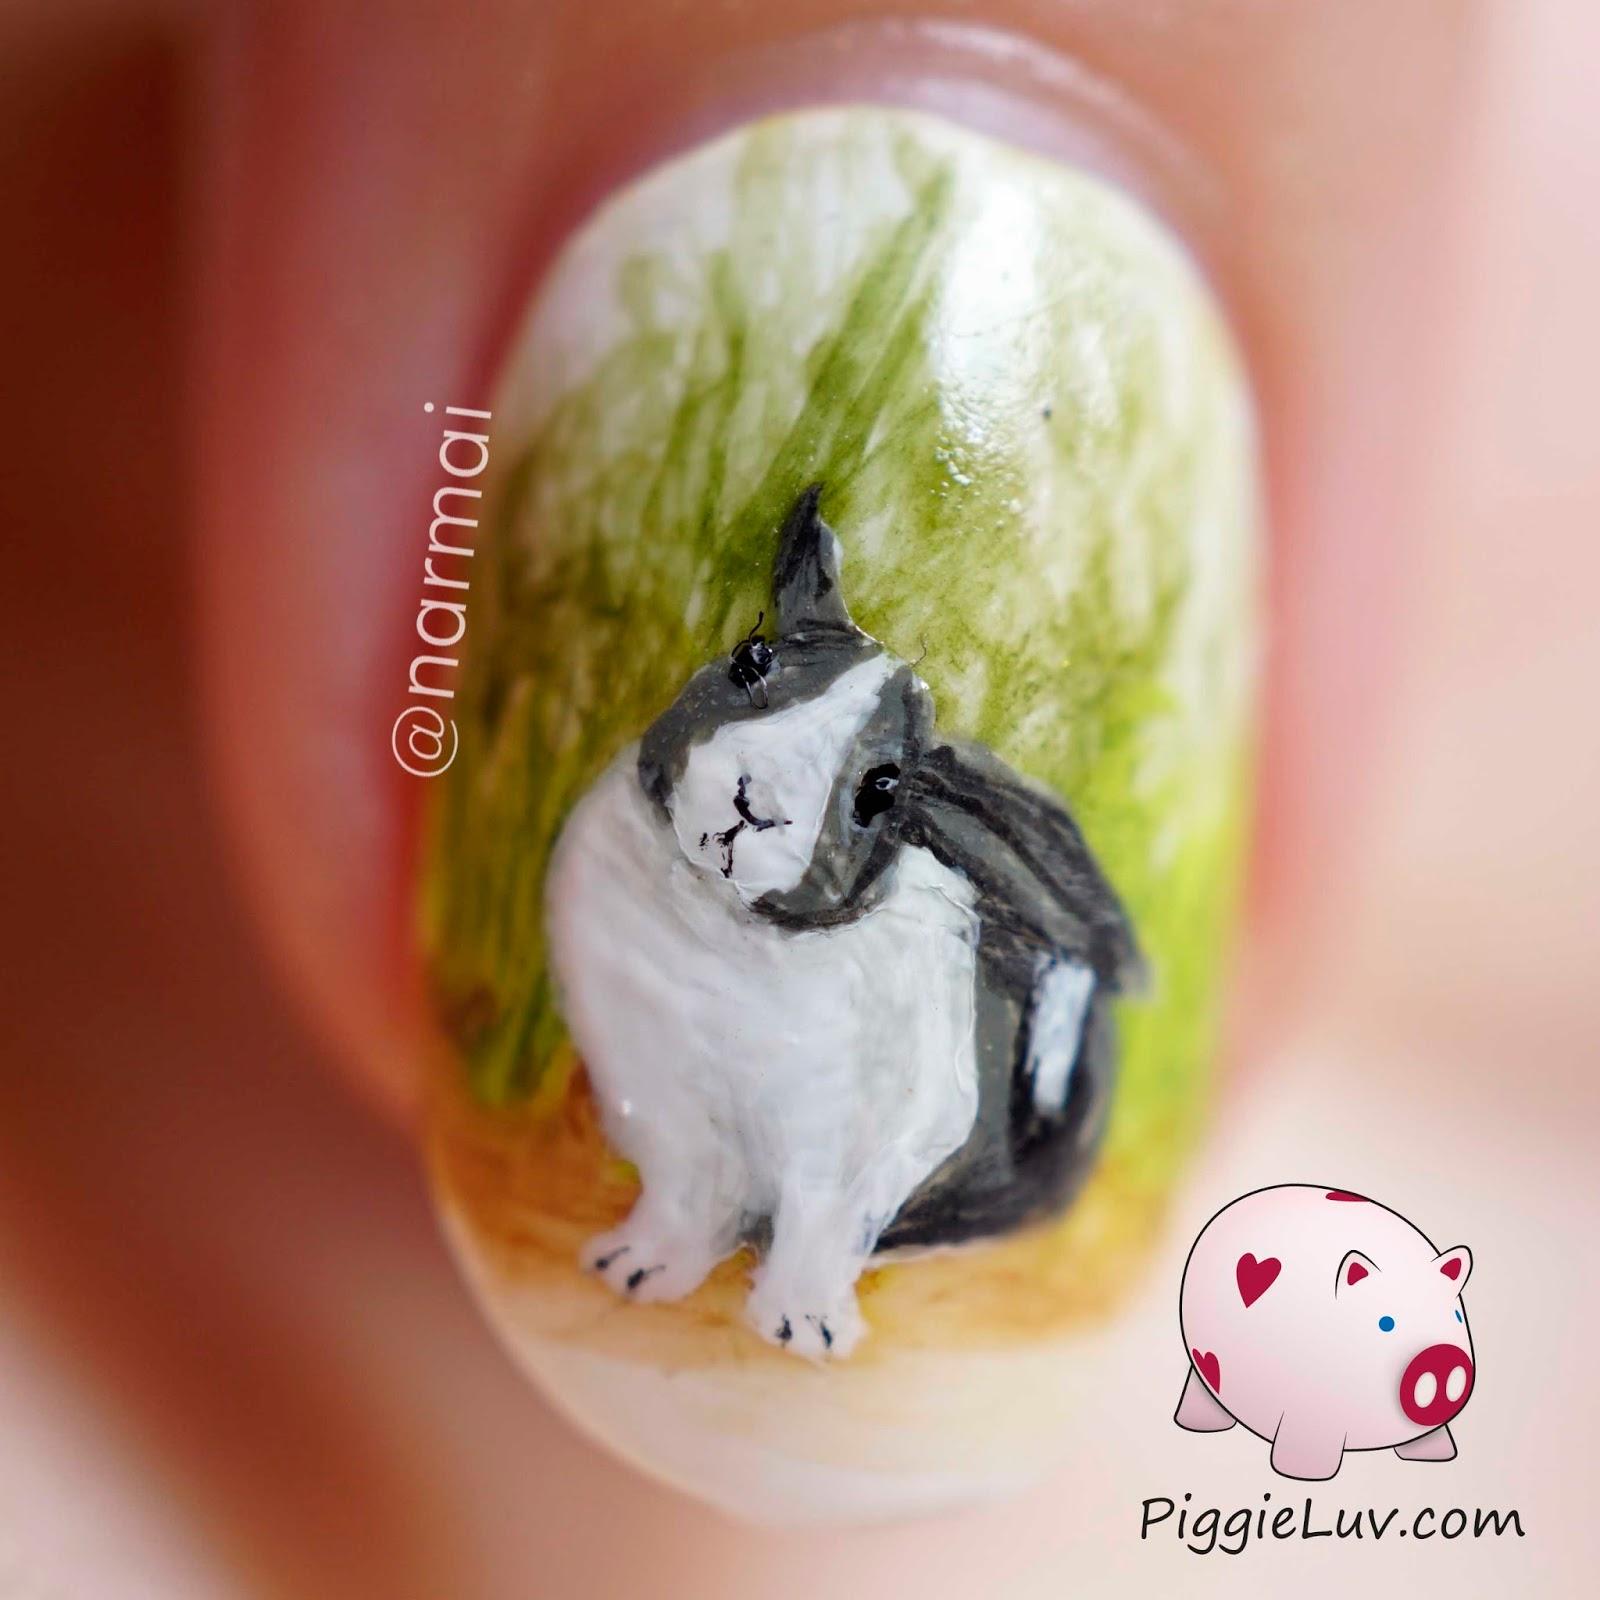 Piggieluv freehand dutch rabbit nail art freehand dutch rabbit nail art prinsesfo Image collections